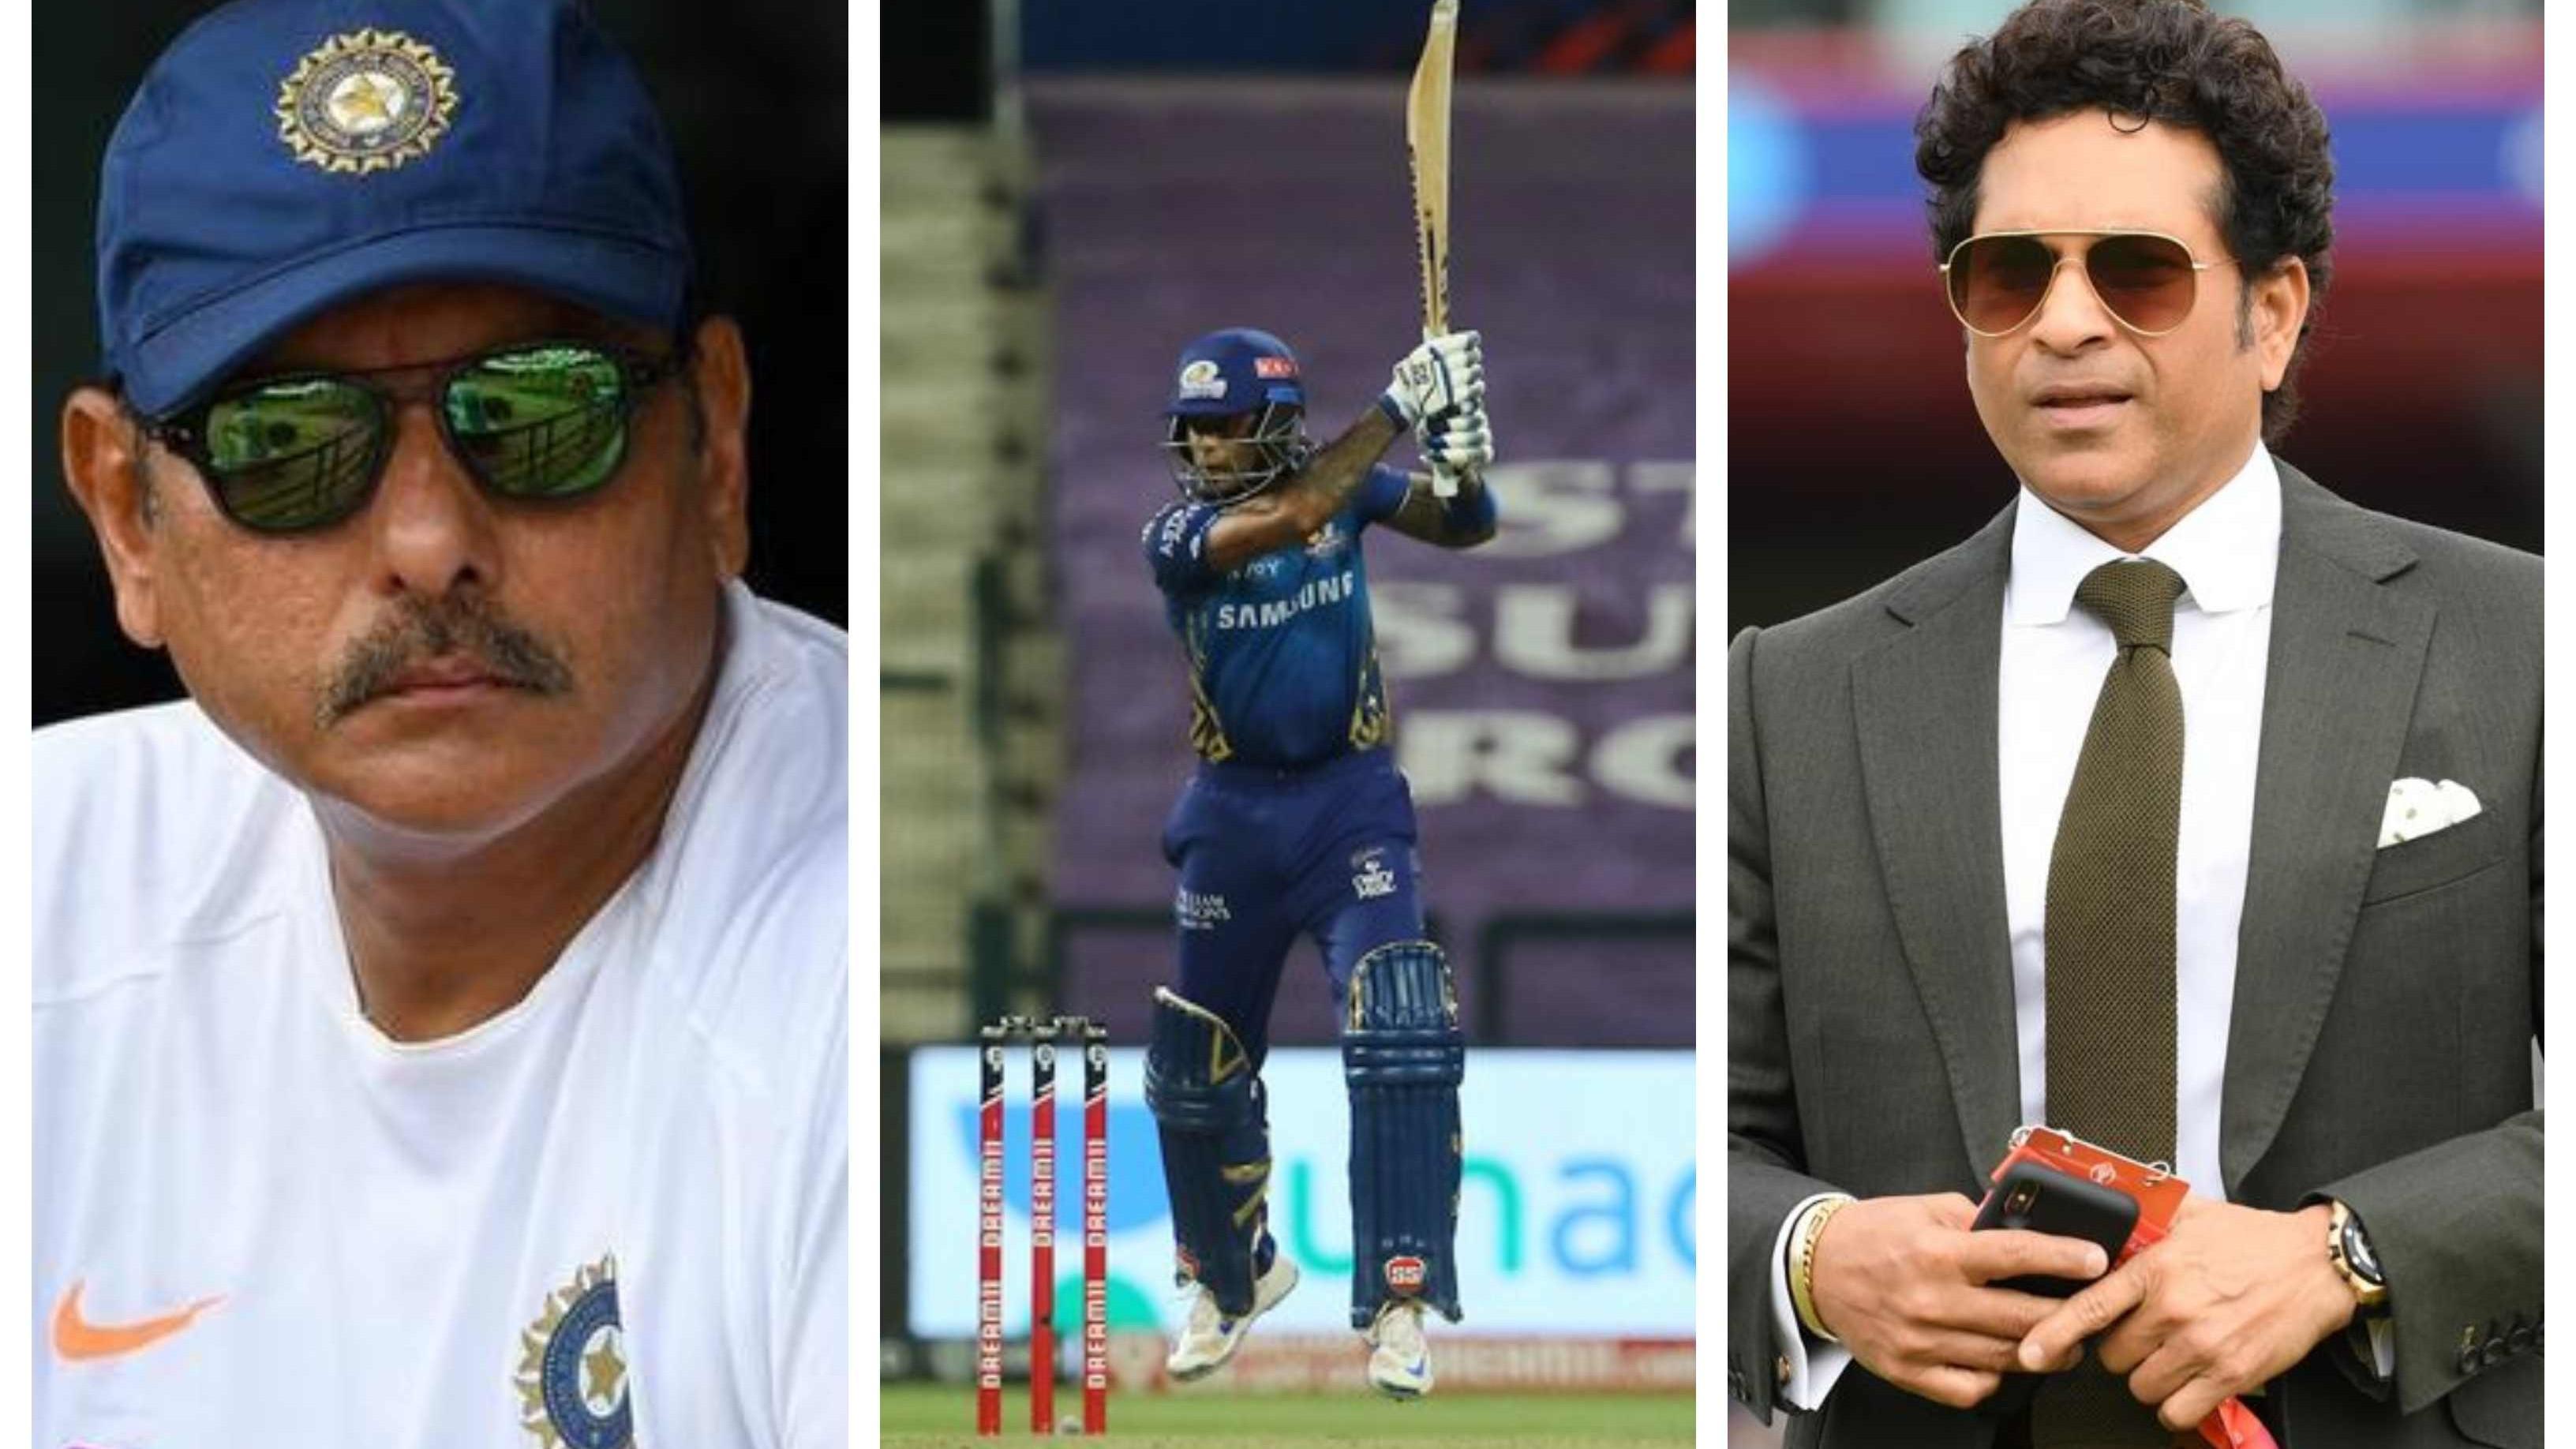 IPL 2020: Cricket fraternity lauds Suryakumar Yadav as his dazzling 79* hands MI 5-wicket win over RCB